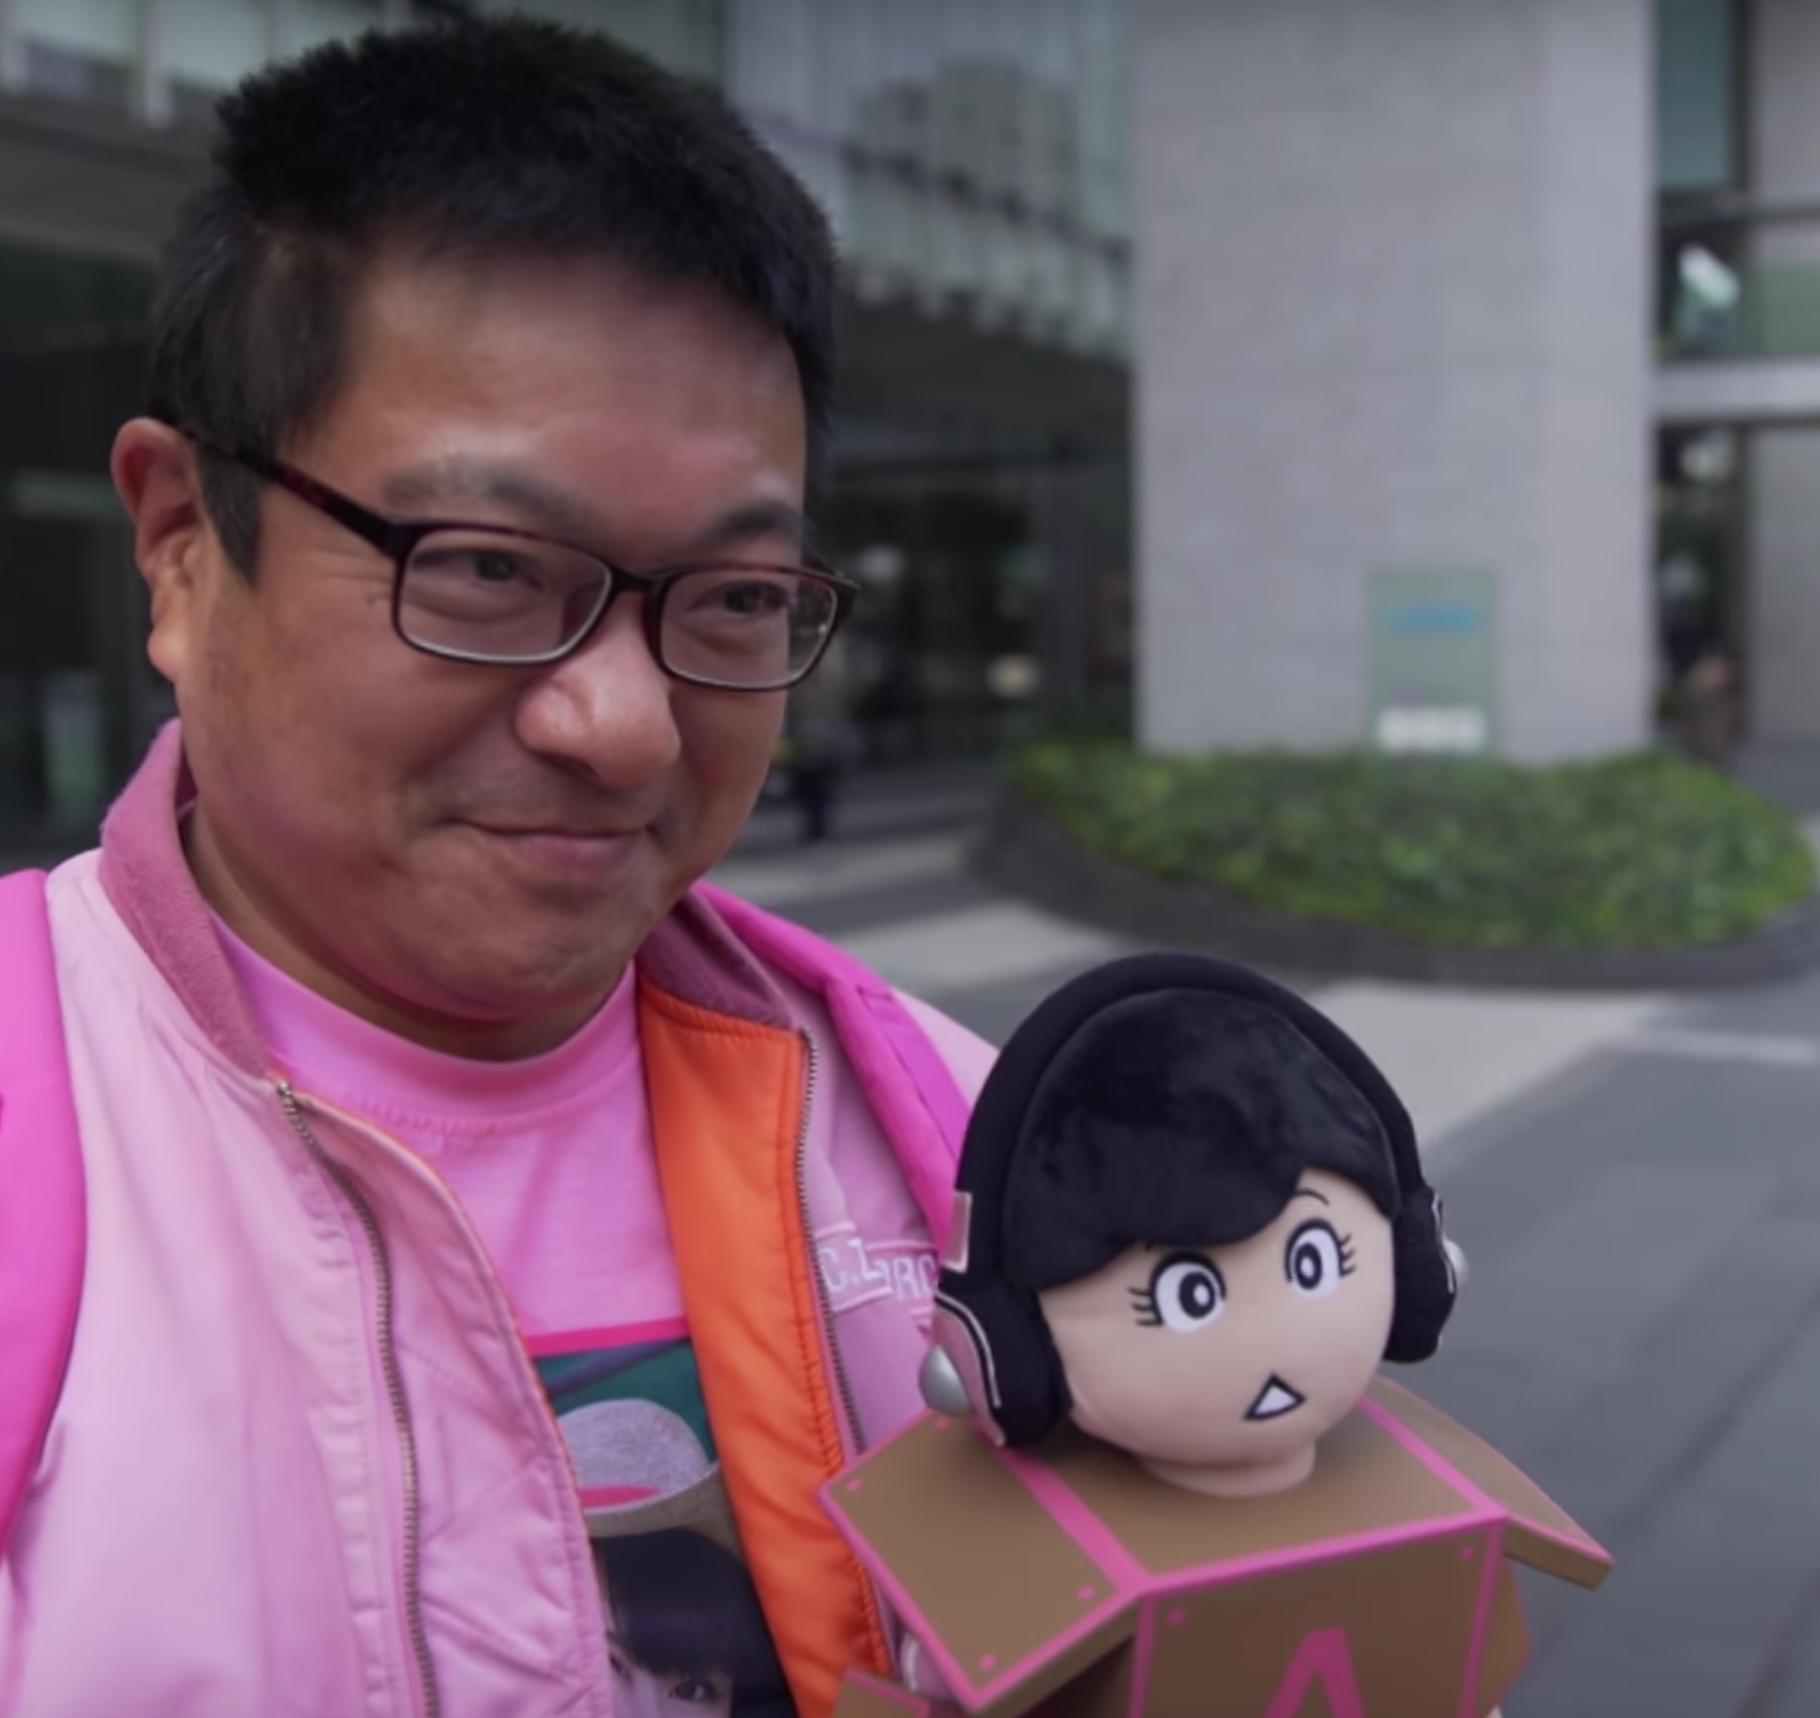 Robot Love in Japan